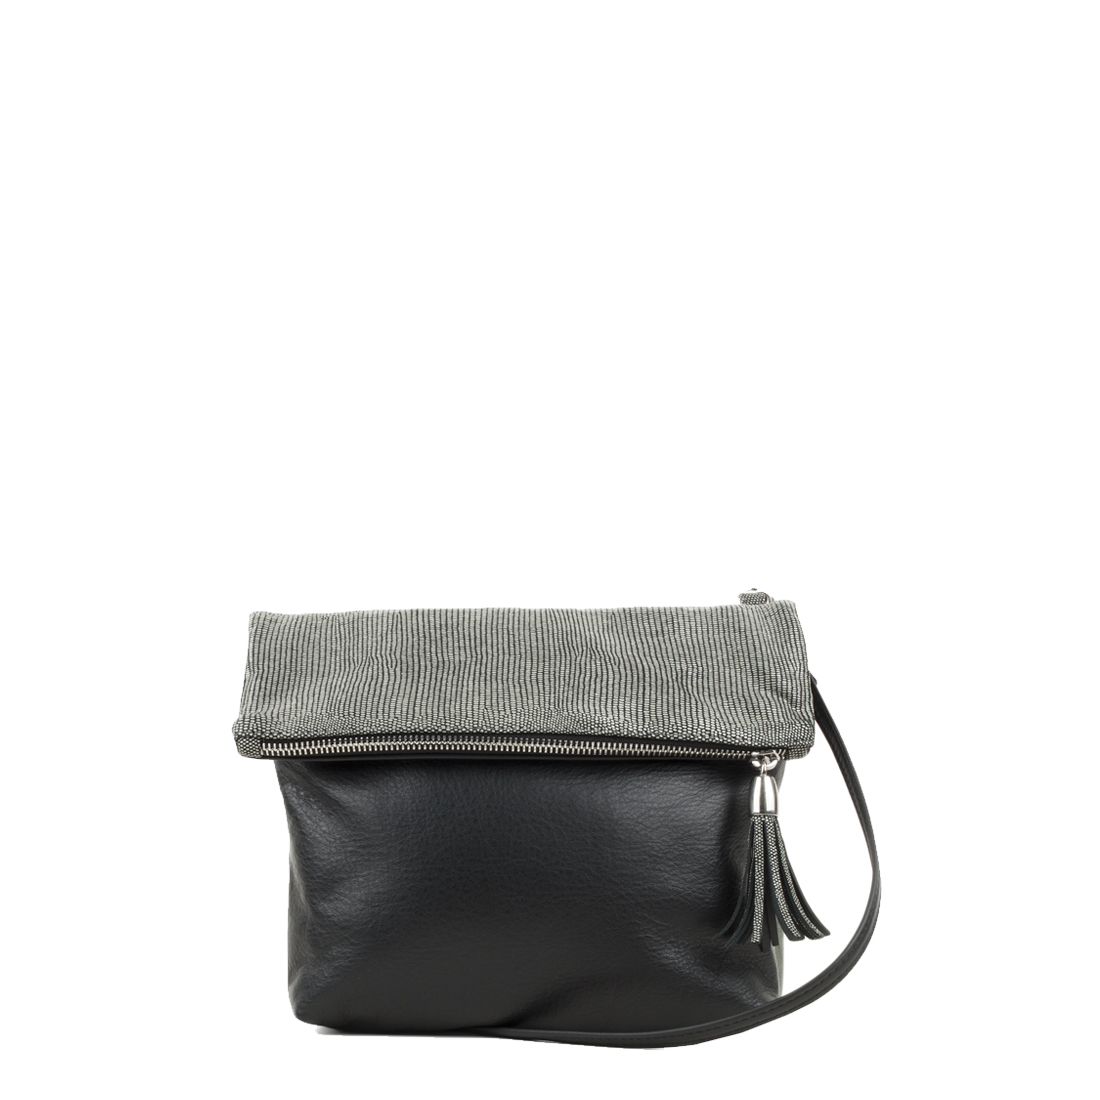 Sofia Black Courmayueur Across Body Bag